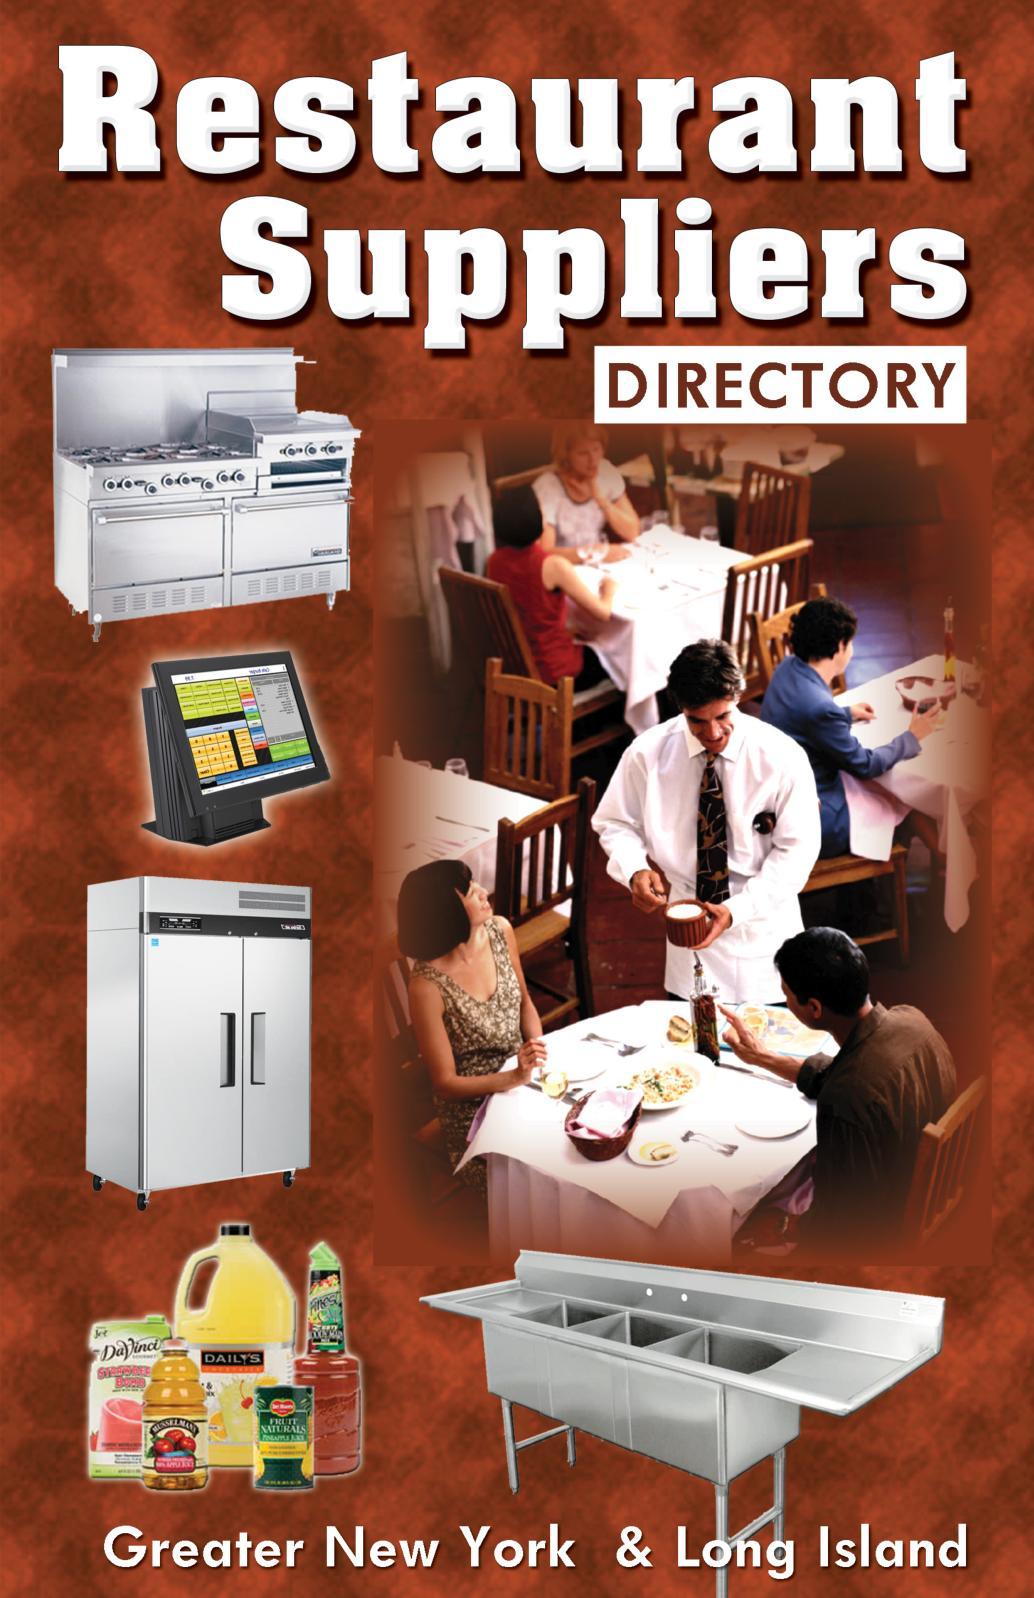 Calaméo - Restaurant Suppliers Directory - NY & LI